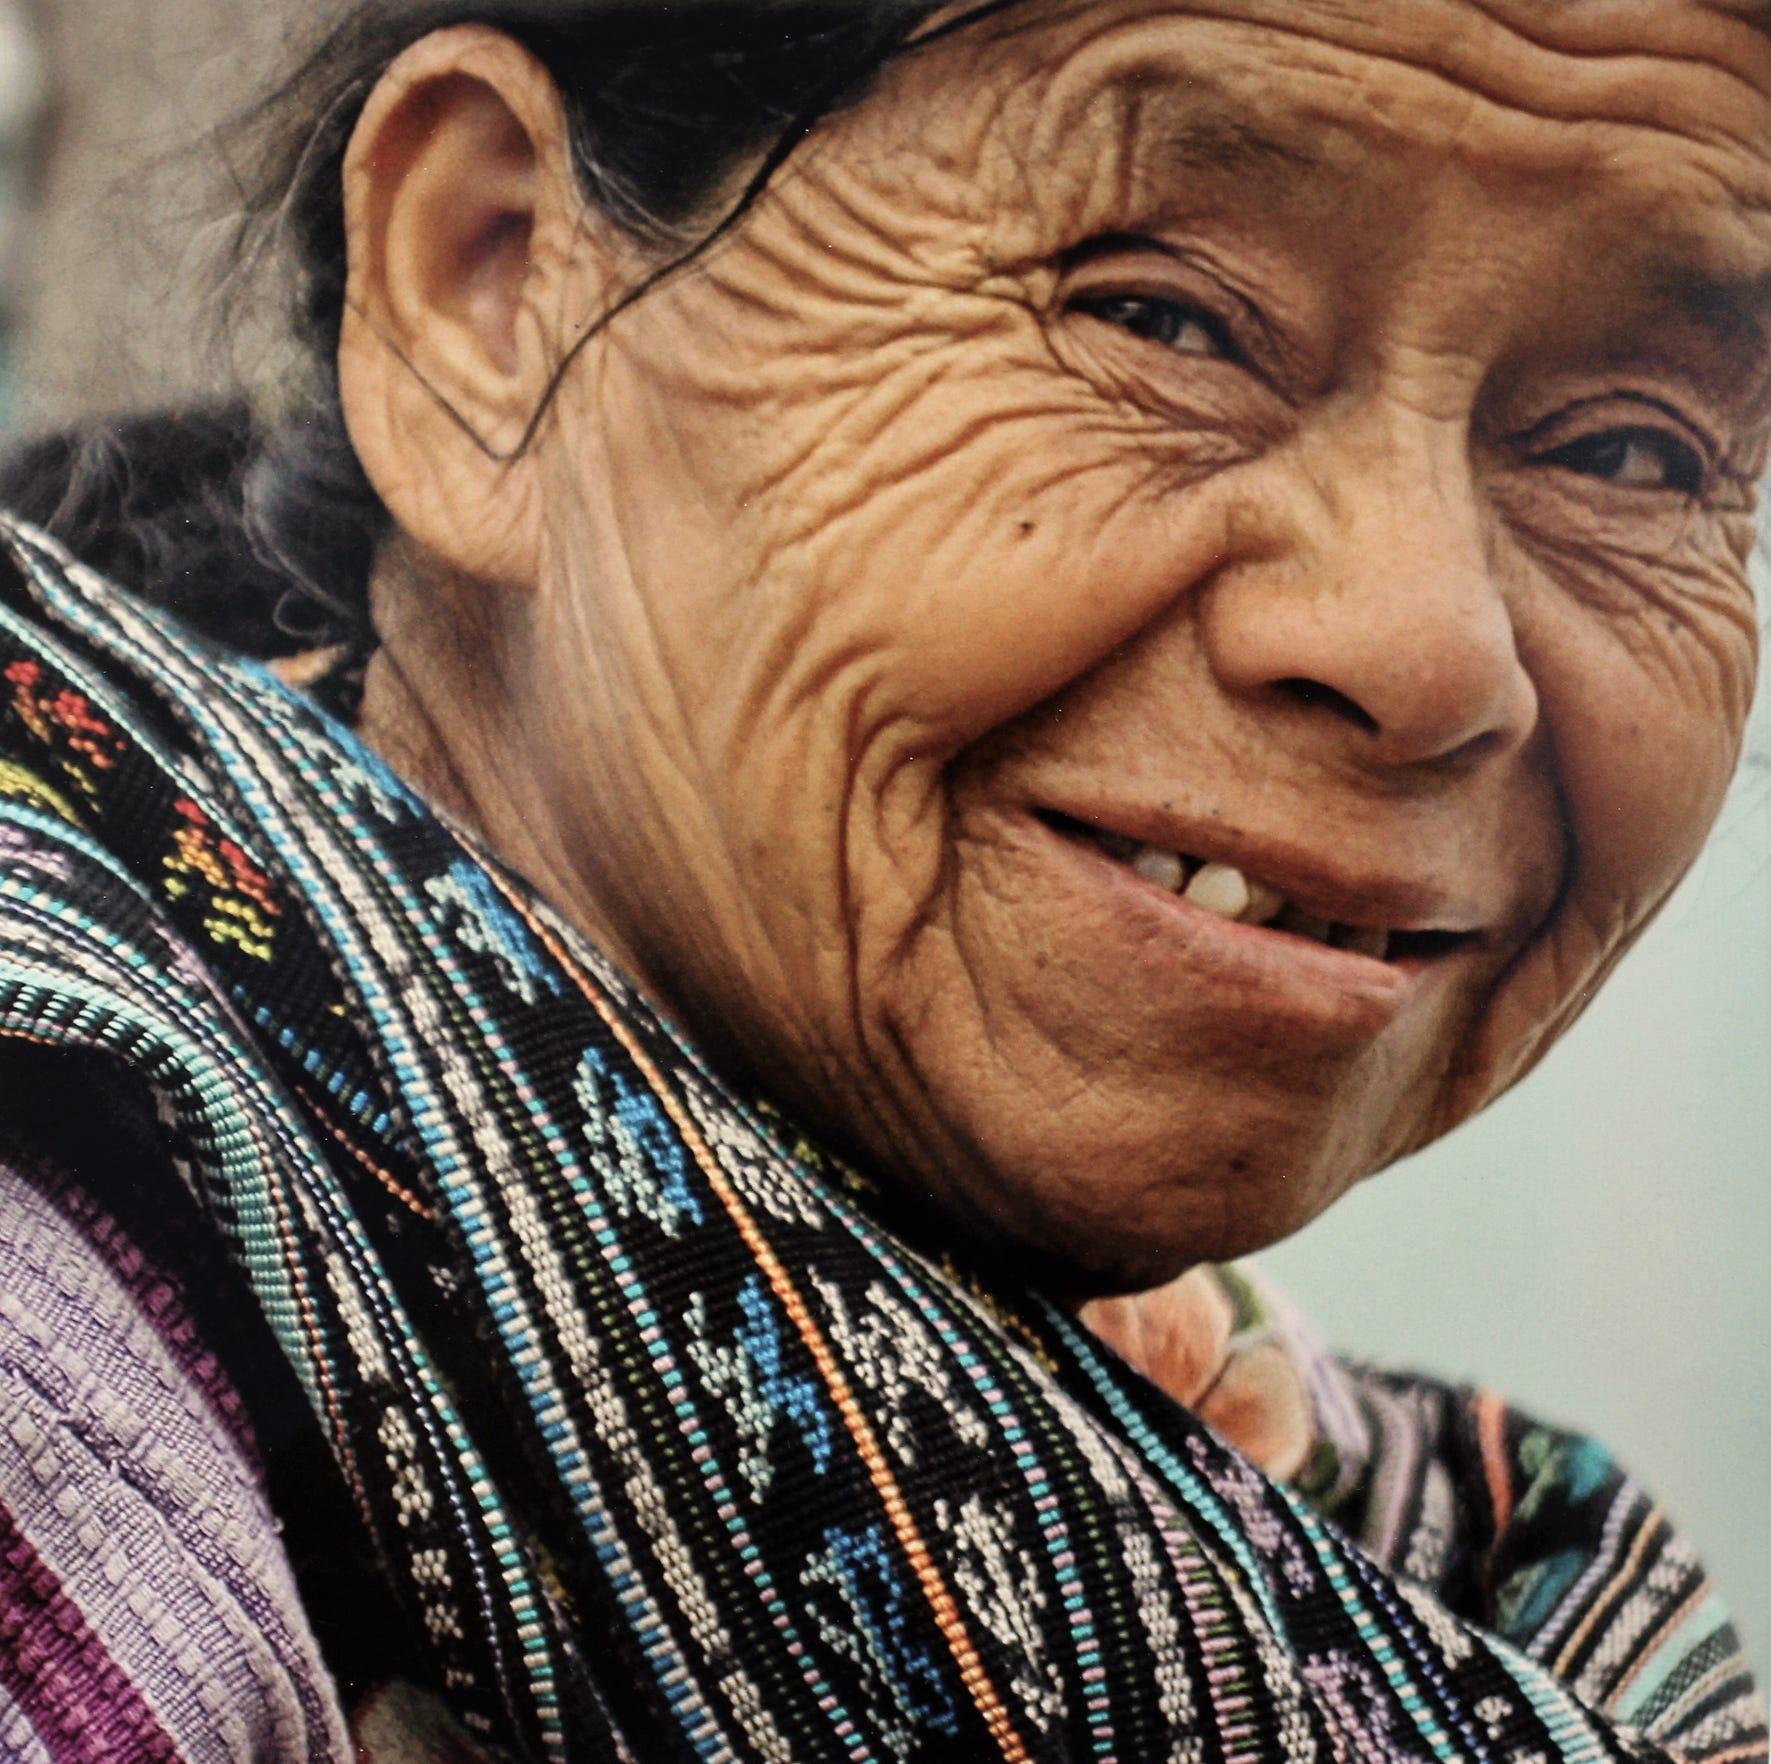 Woven cloth seller, Lake Atitlan, Guatemala